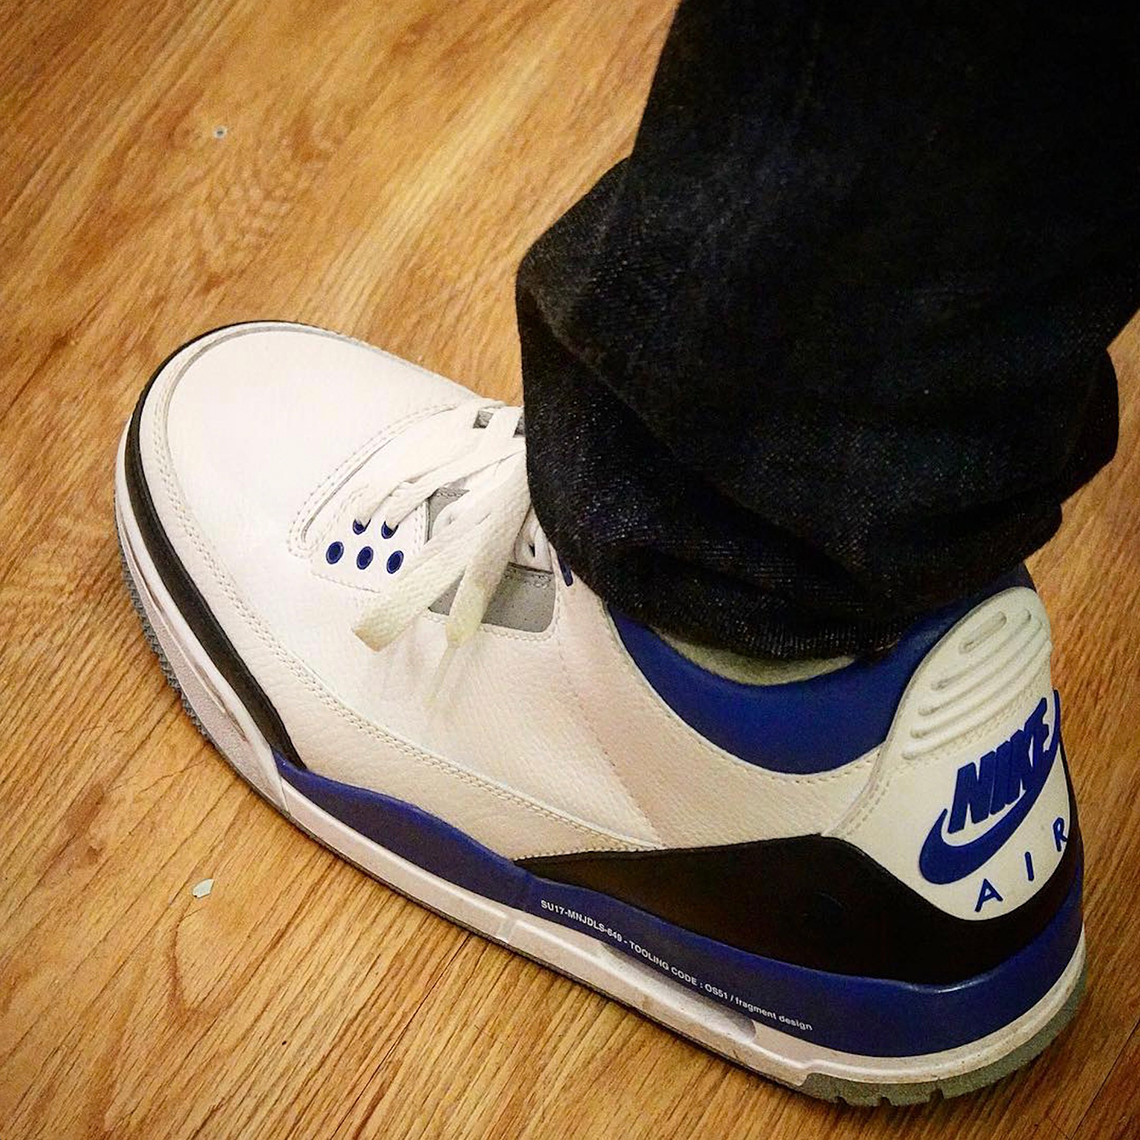 Fragment x Air Jordan 3